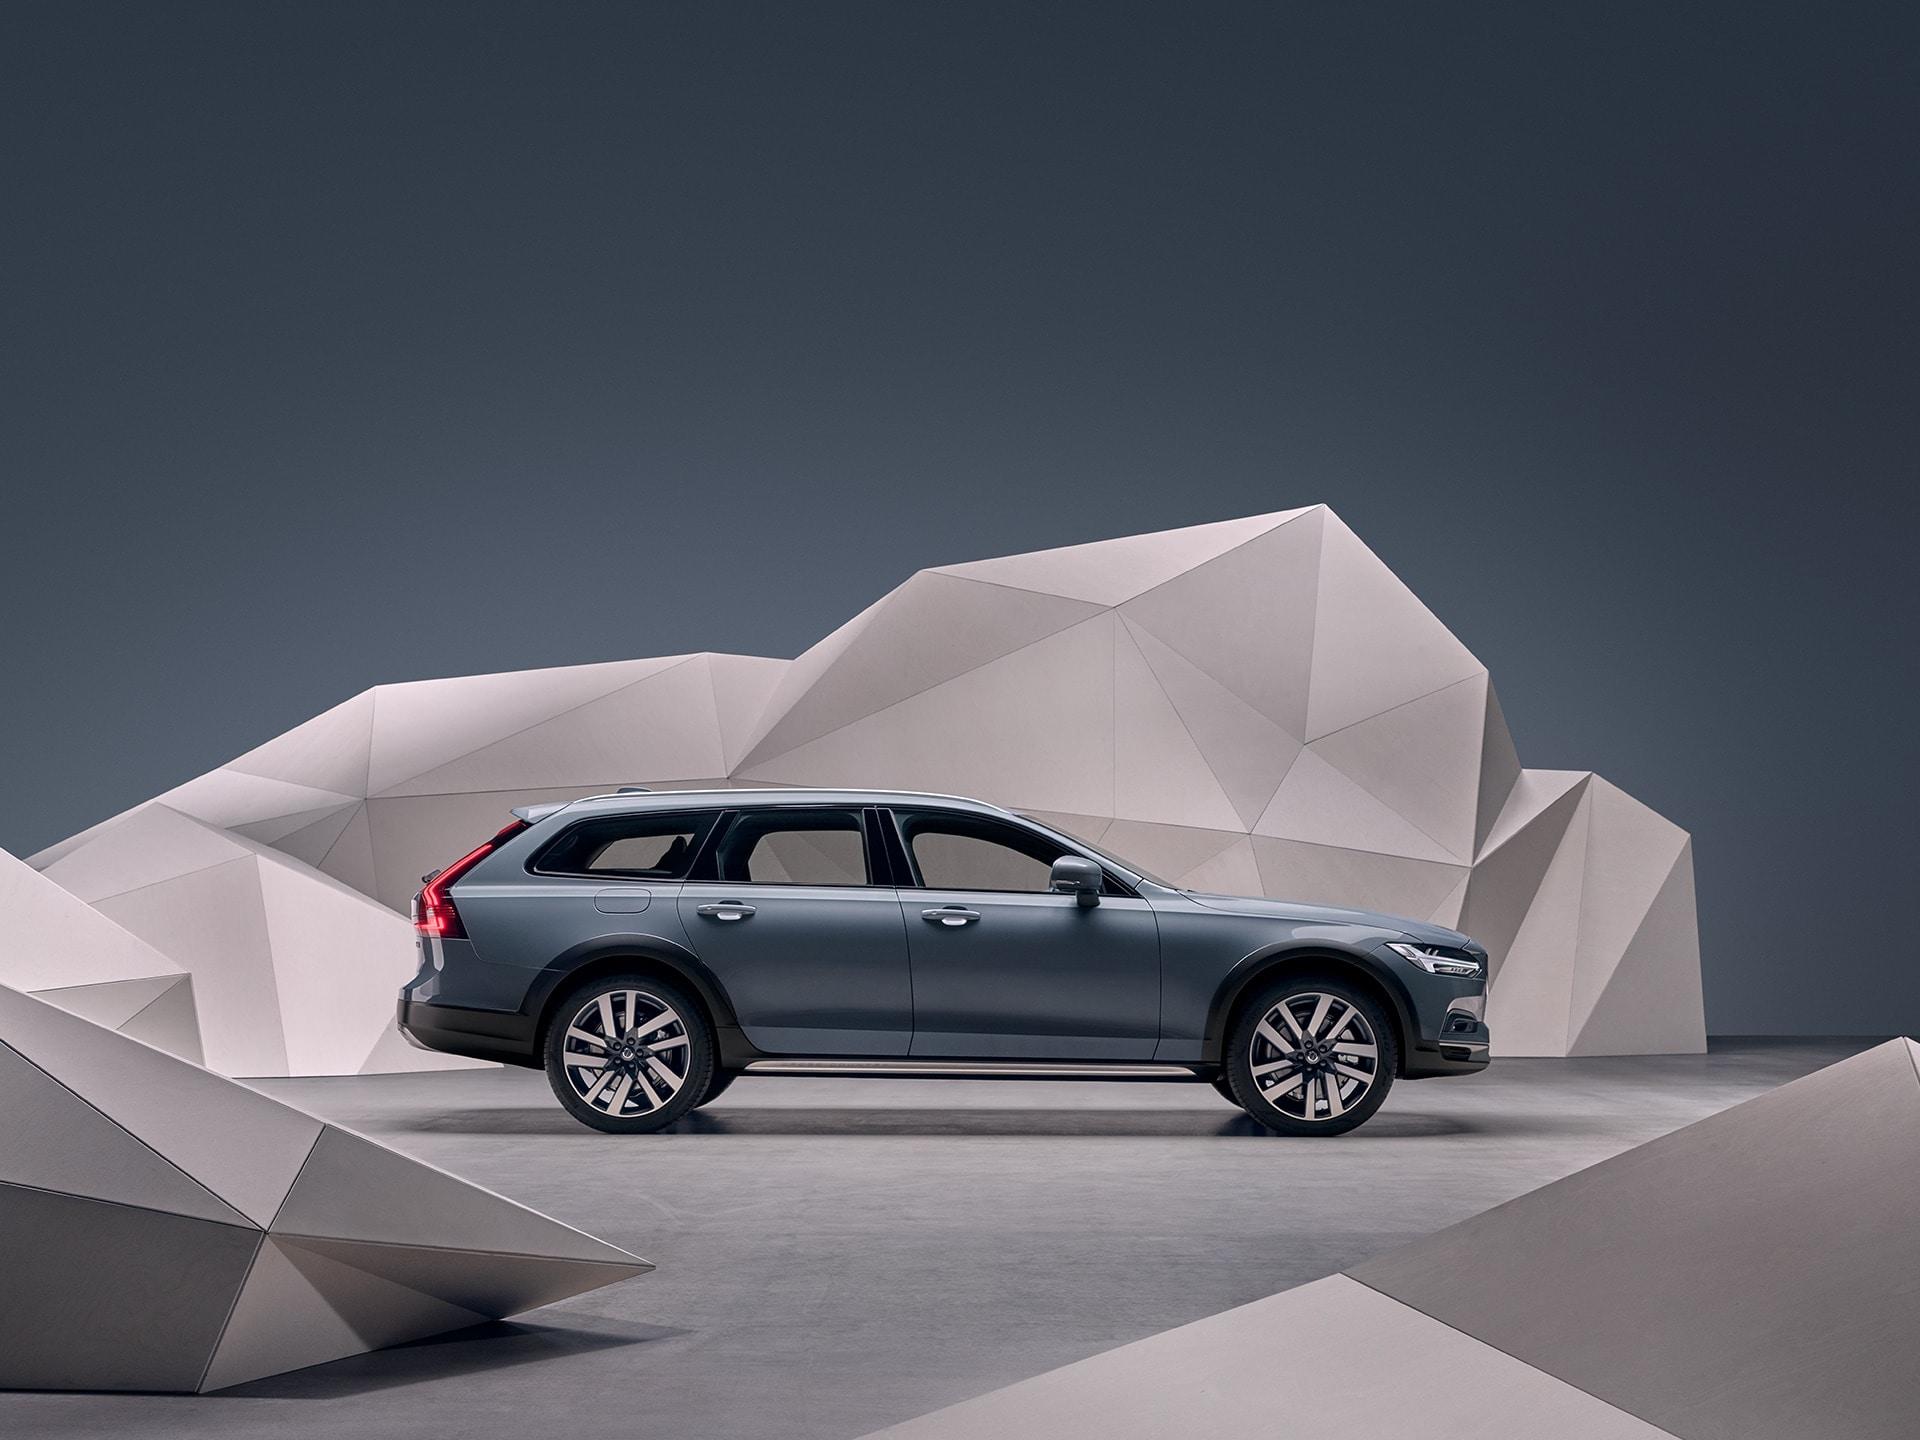 Break hybride rechargeable Volvo V90 Cross Country Mussel Blue Metallic devant un mur artistique.